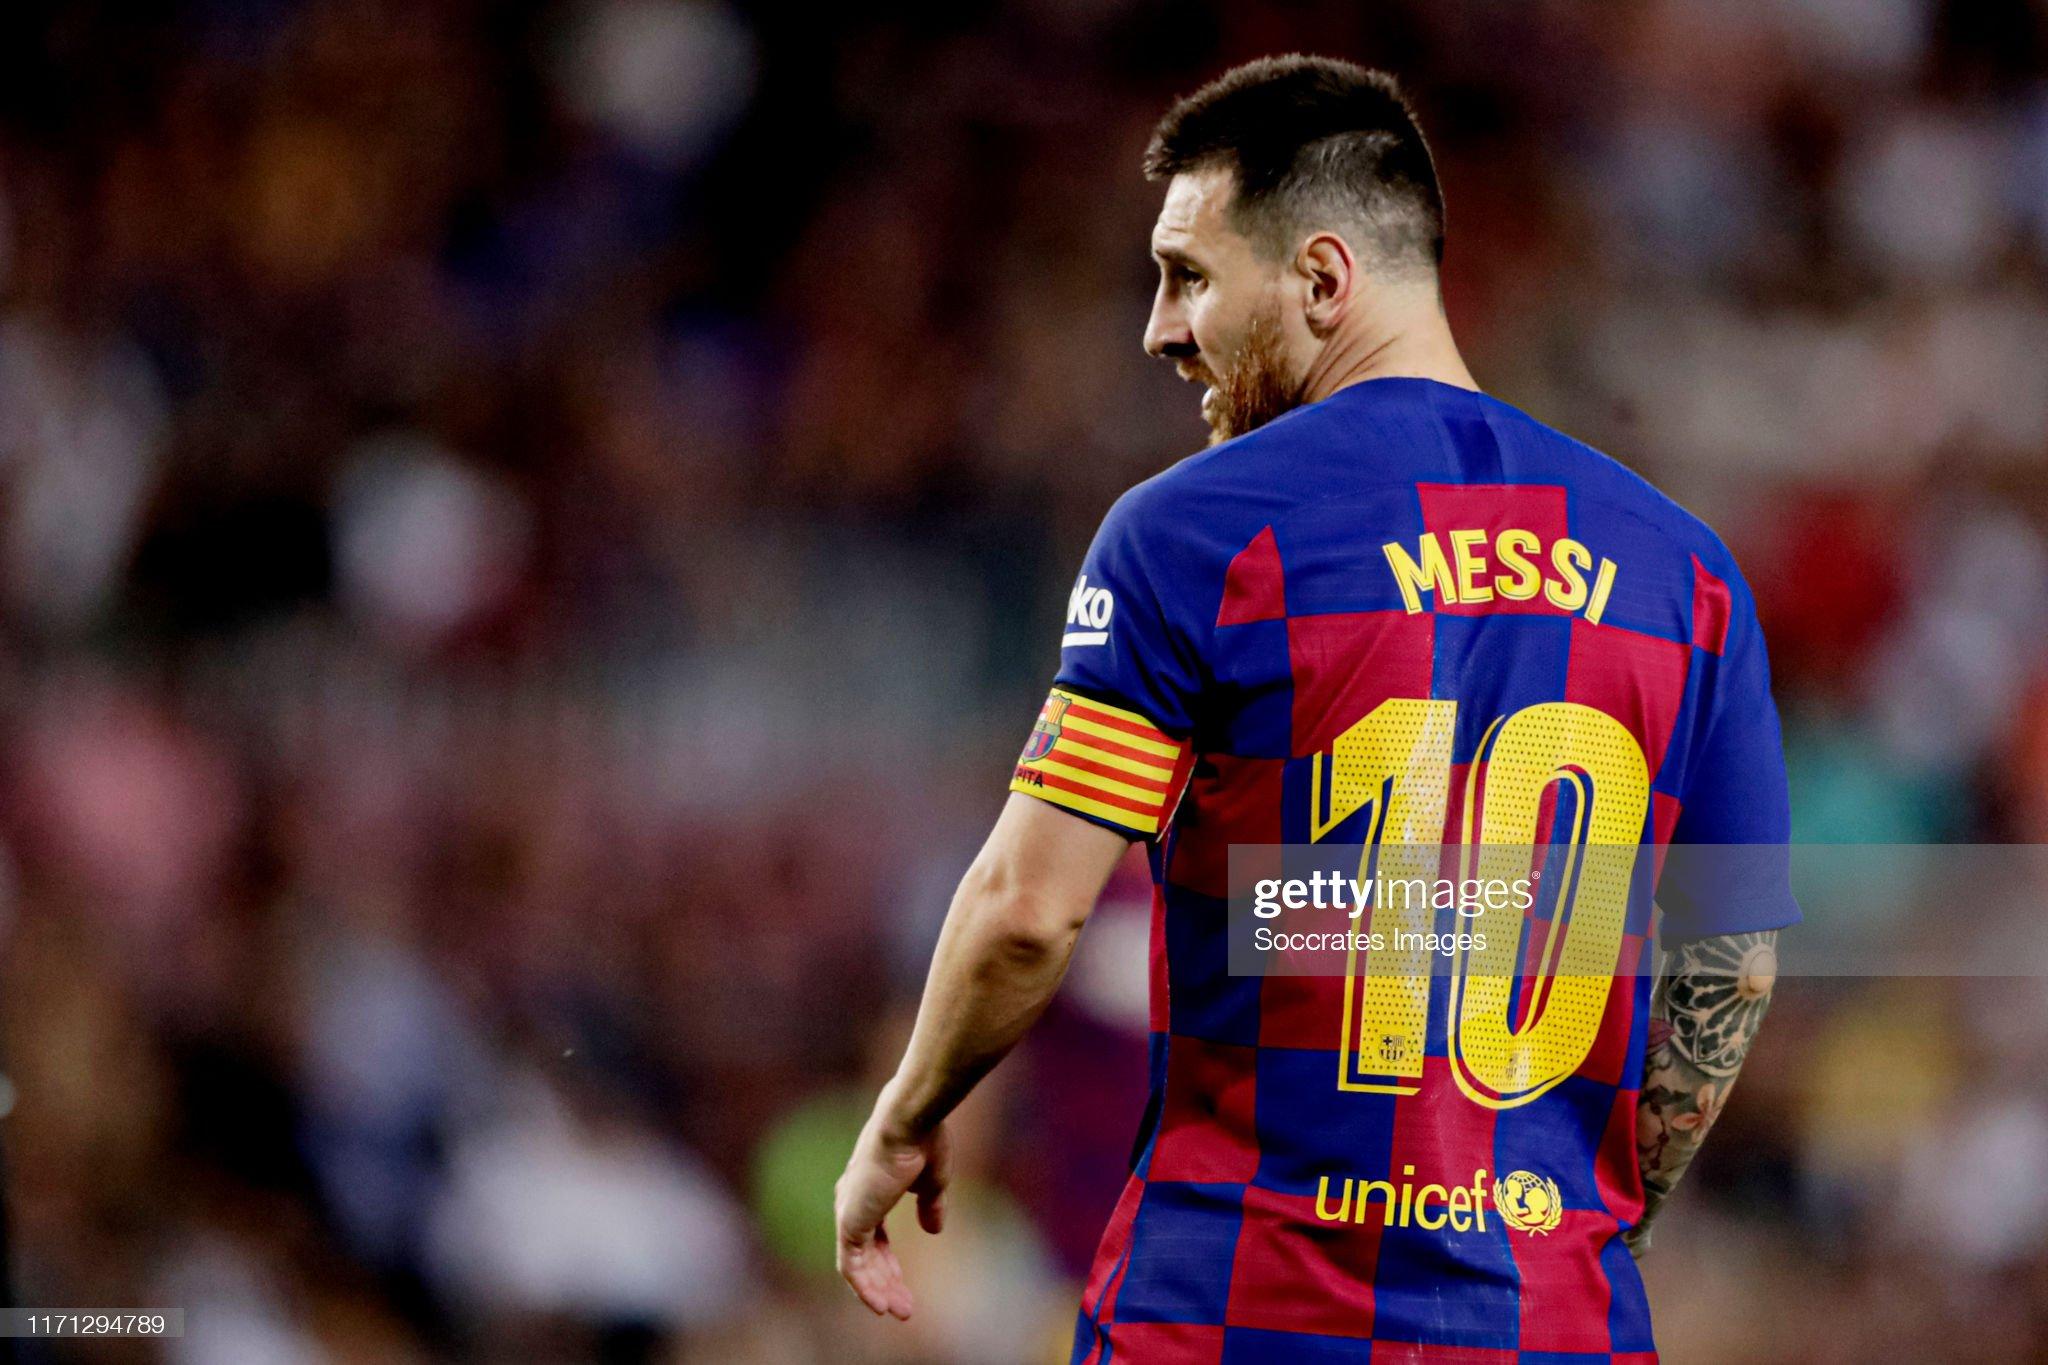 صور مباراة : برشلونة - فياريال 2-1 ( 24-09-2019 )  Lionel-messi-of-fc-barcelona-during-the-la-liga-santander-match-fc-picture-id1171294789?s=2048x2048